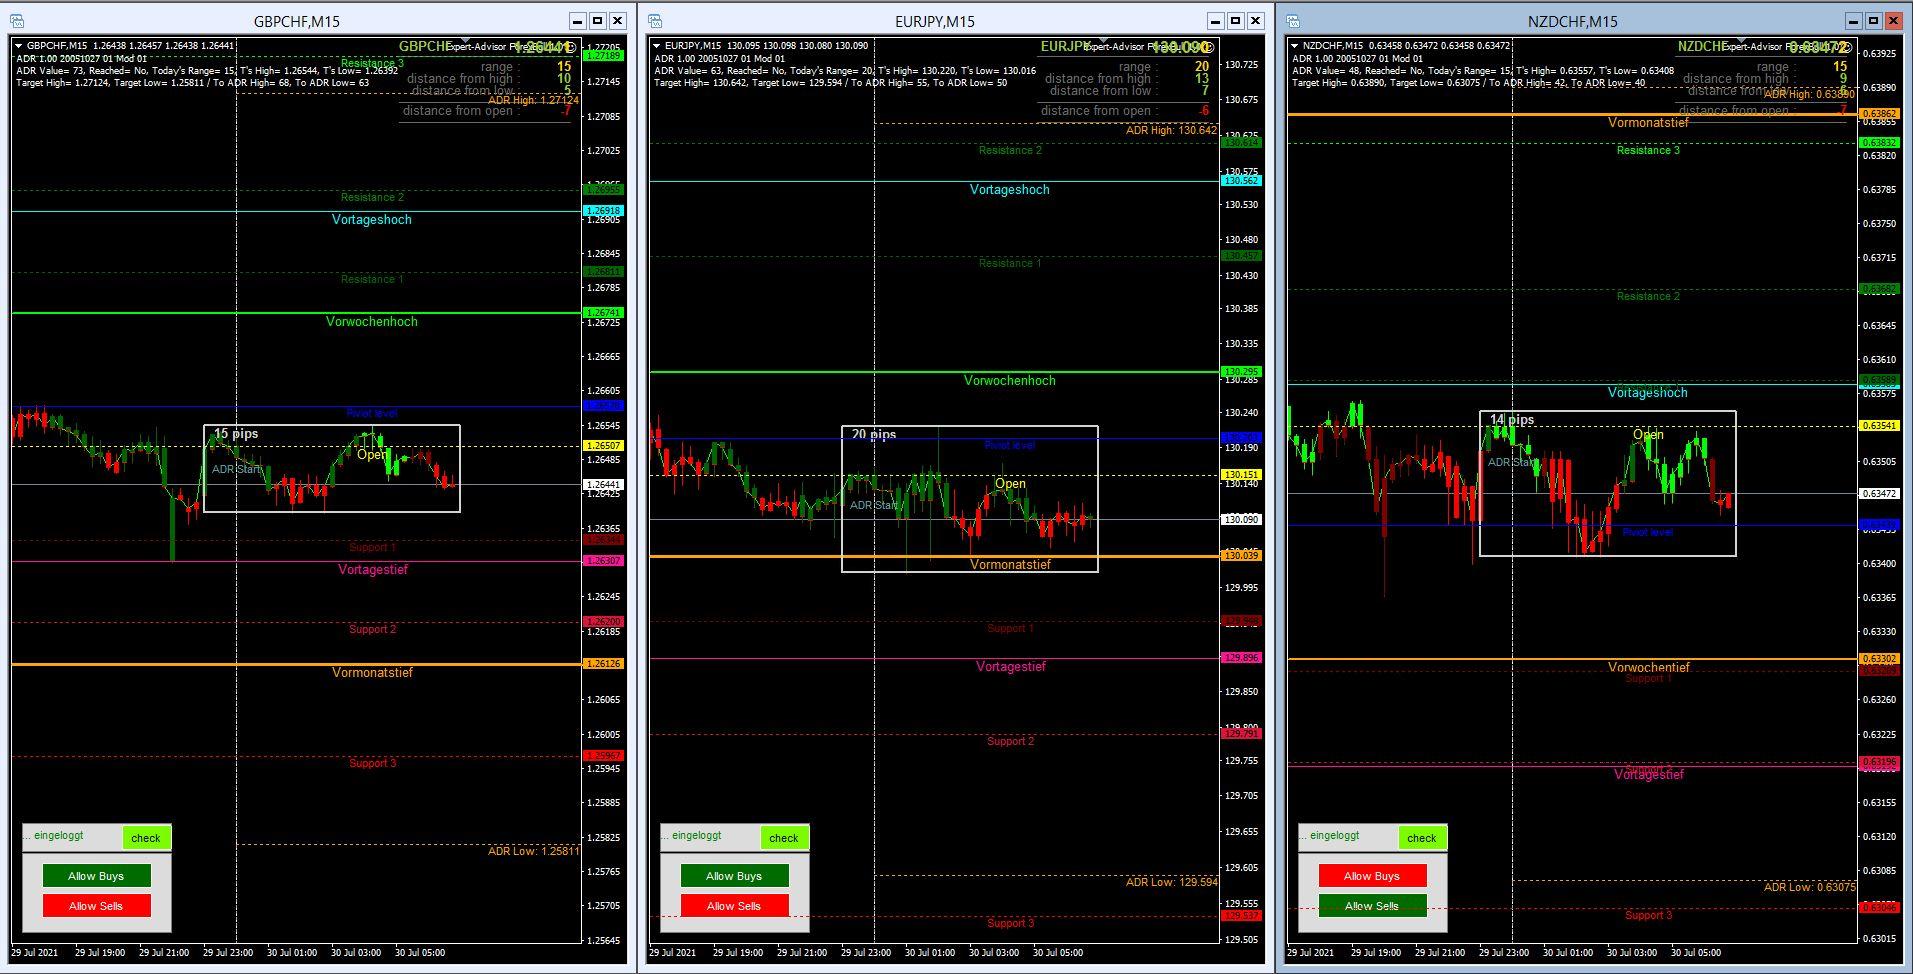 Morning-Briefing-ForexBull-EUR-JPY-und-GBP-CHF-mit-Long-Setups-Chartanalyse-JFD-Bank-GodmodeTrader.de-2